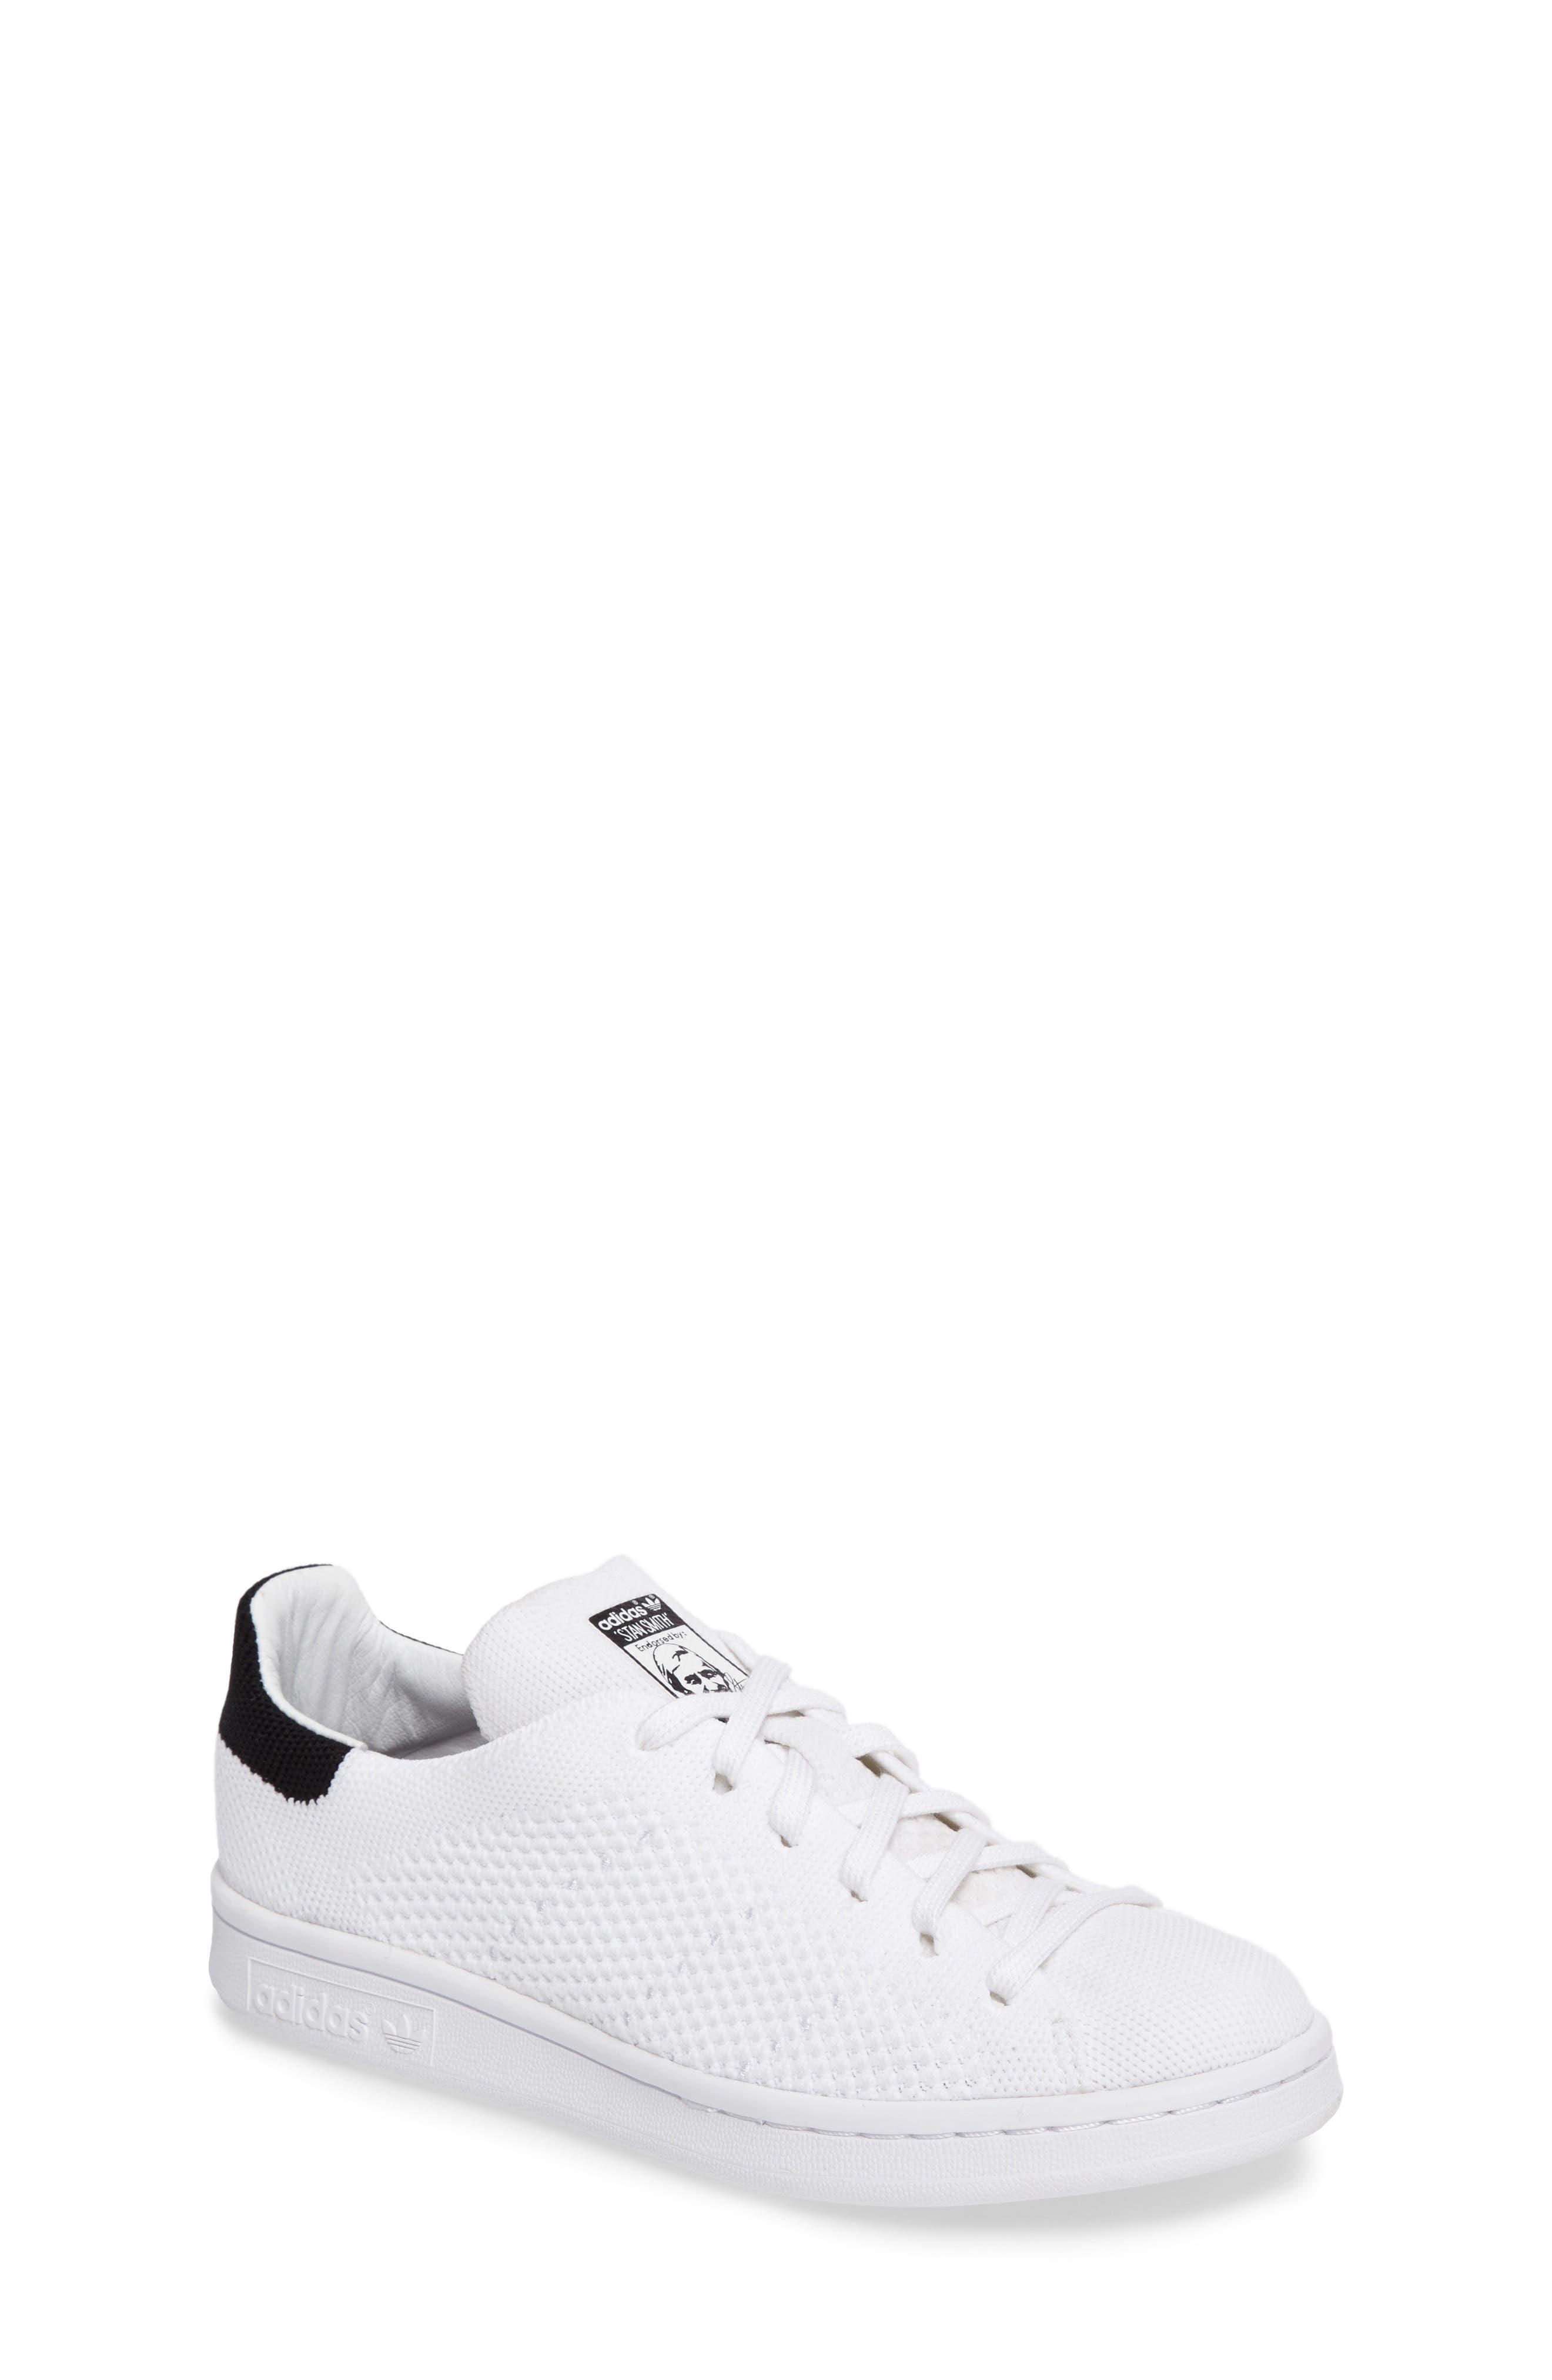 Stan Smith Primeknit Sneaker,                         Main,                         color, Footwear White